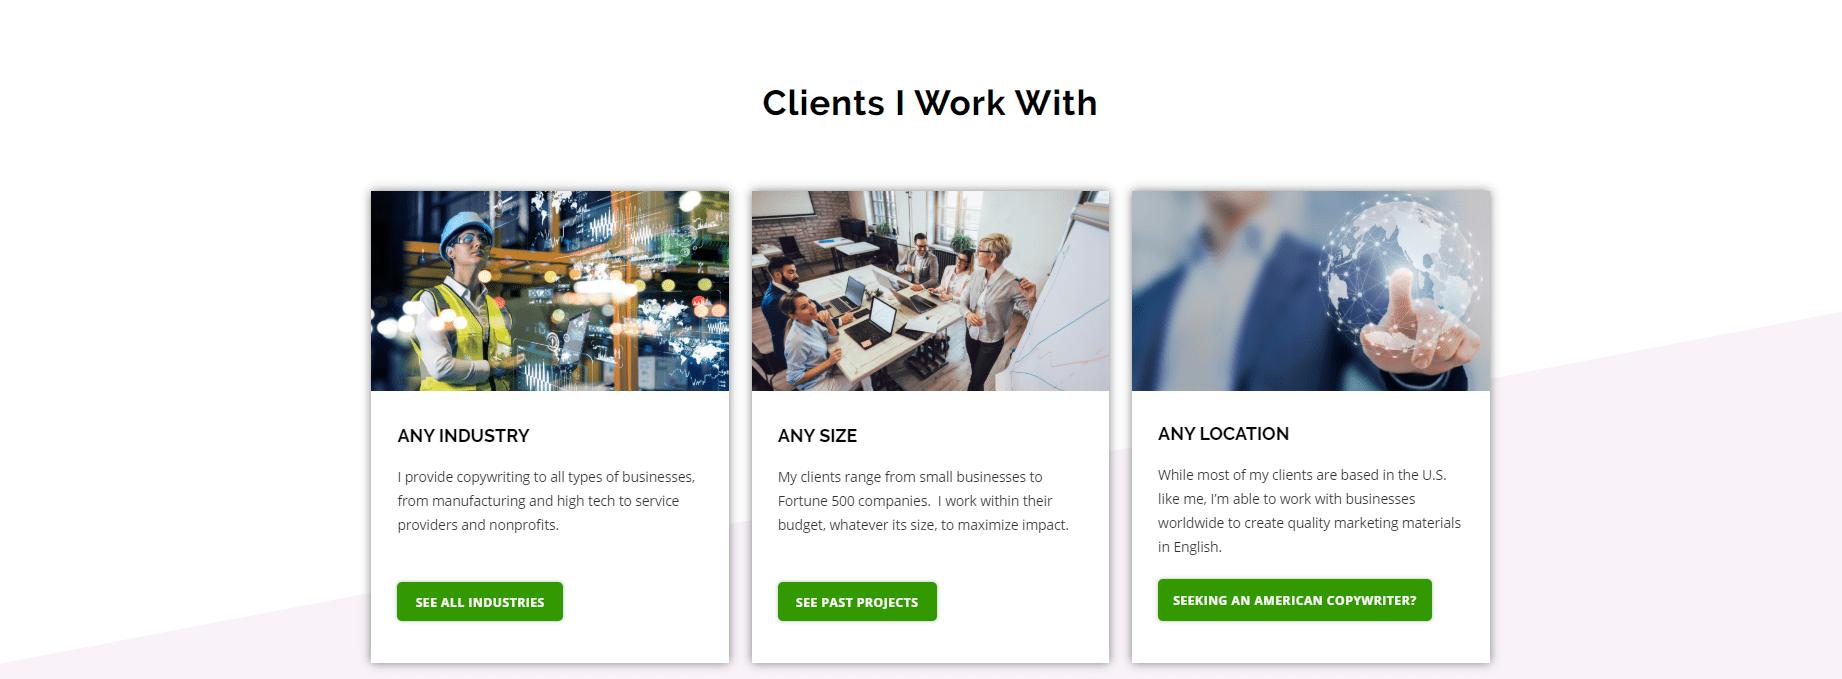 Susan Greene clients